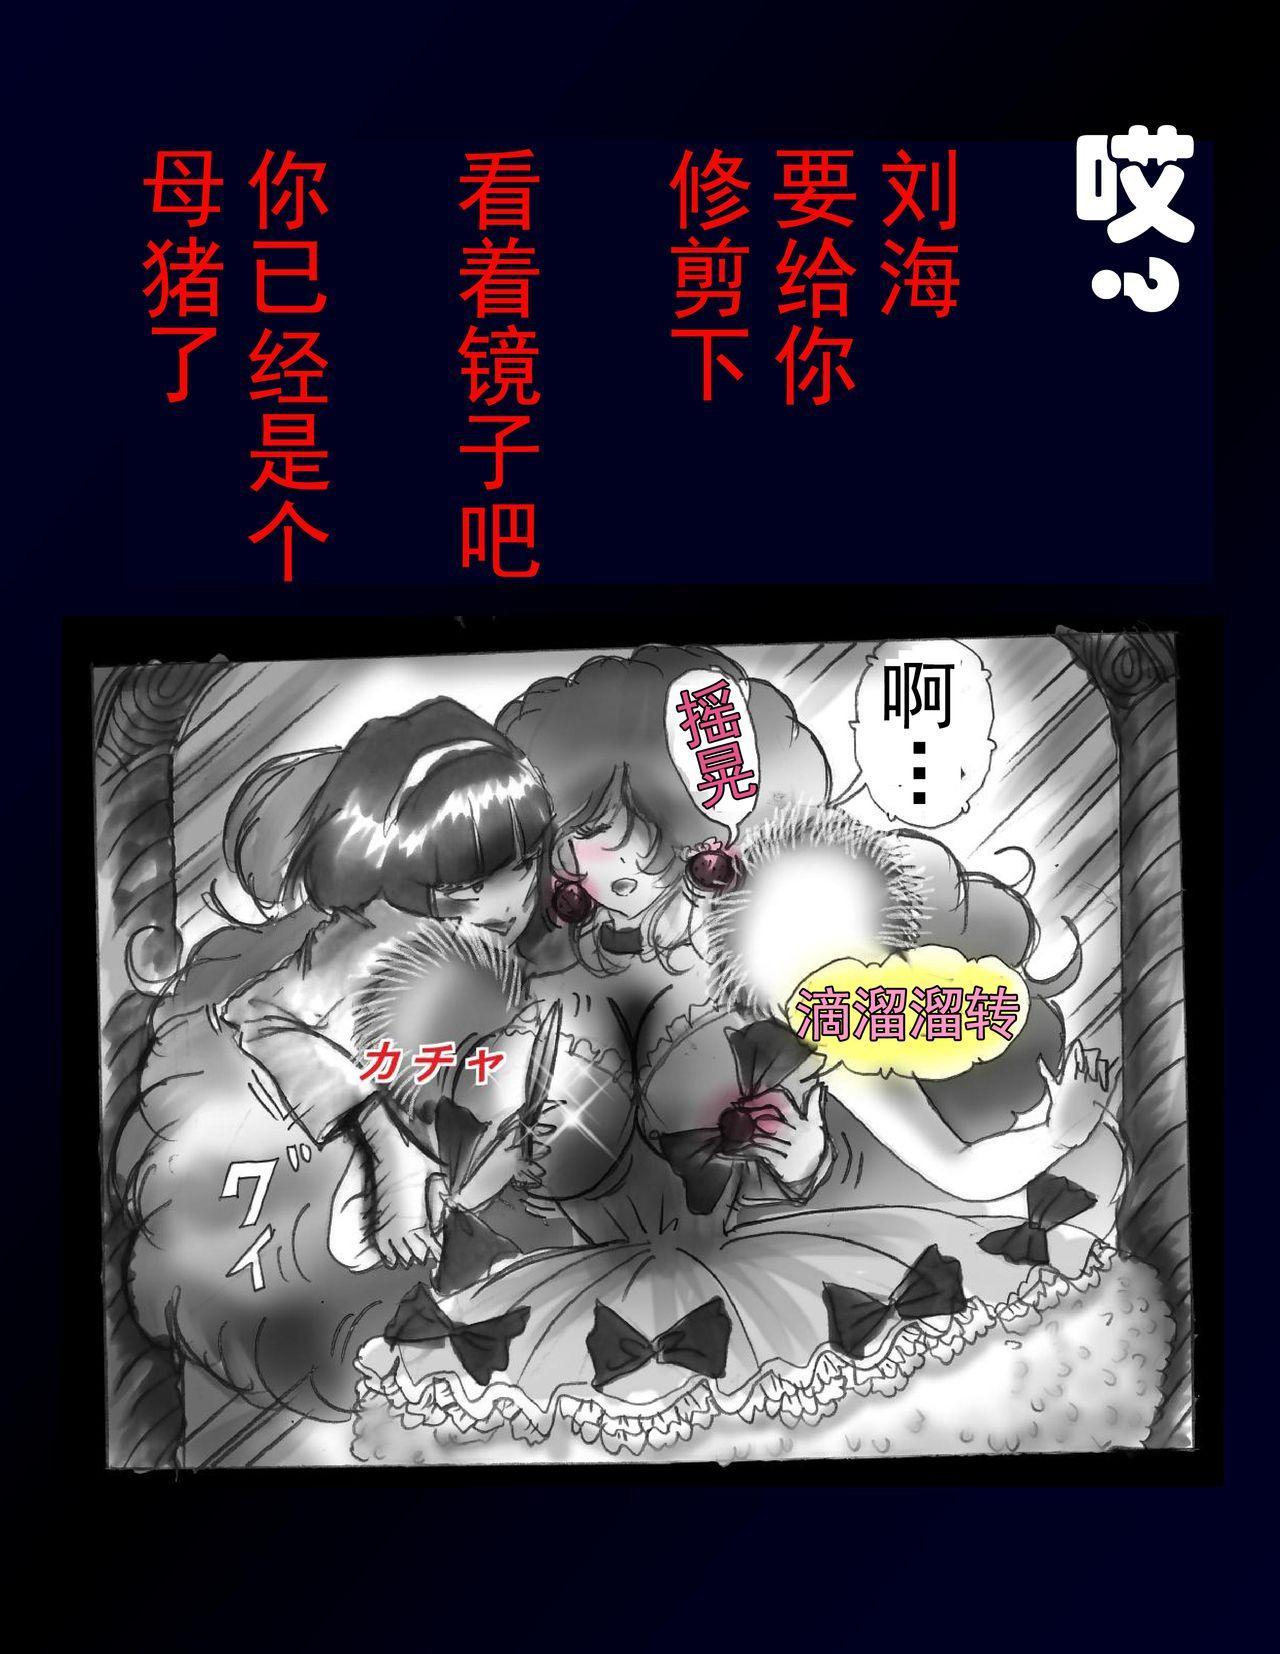 Kyousei Nyotaika Dress 63